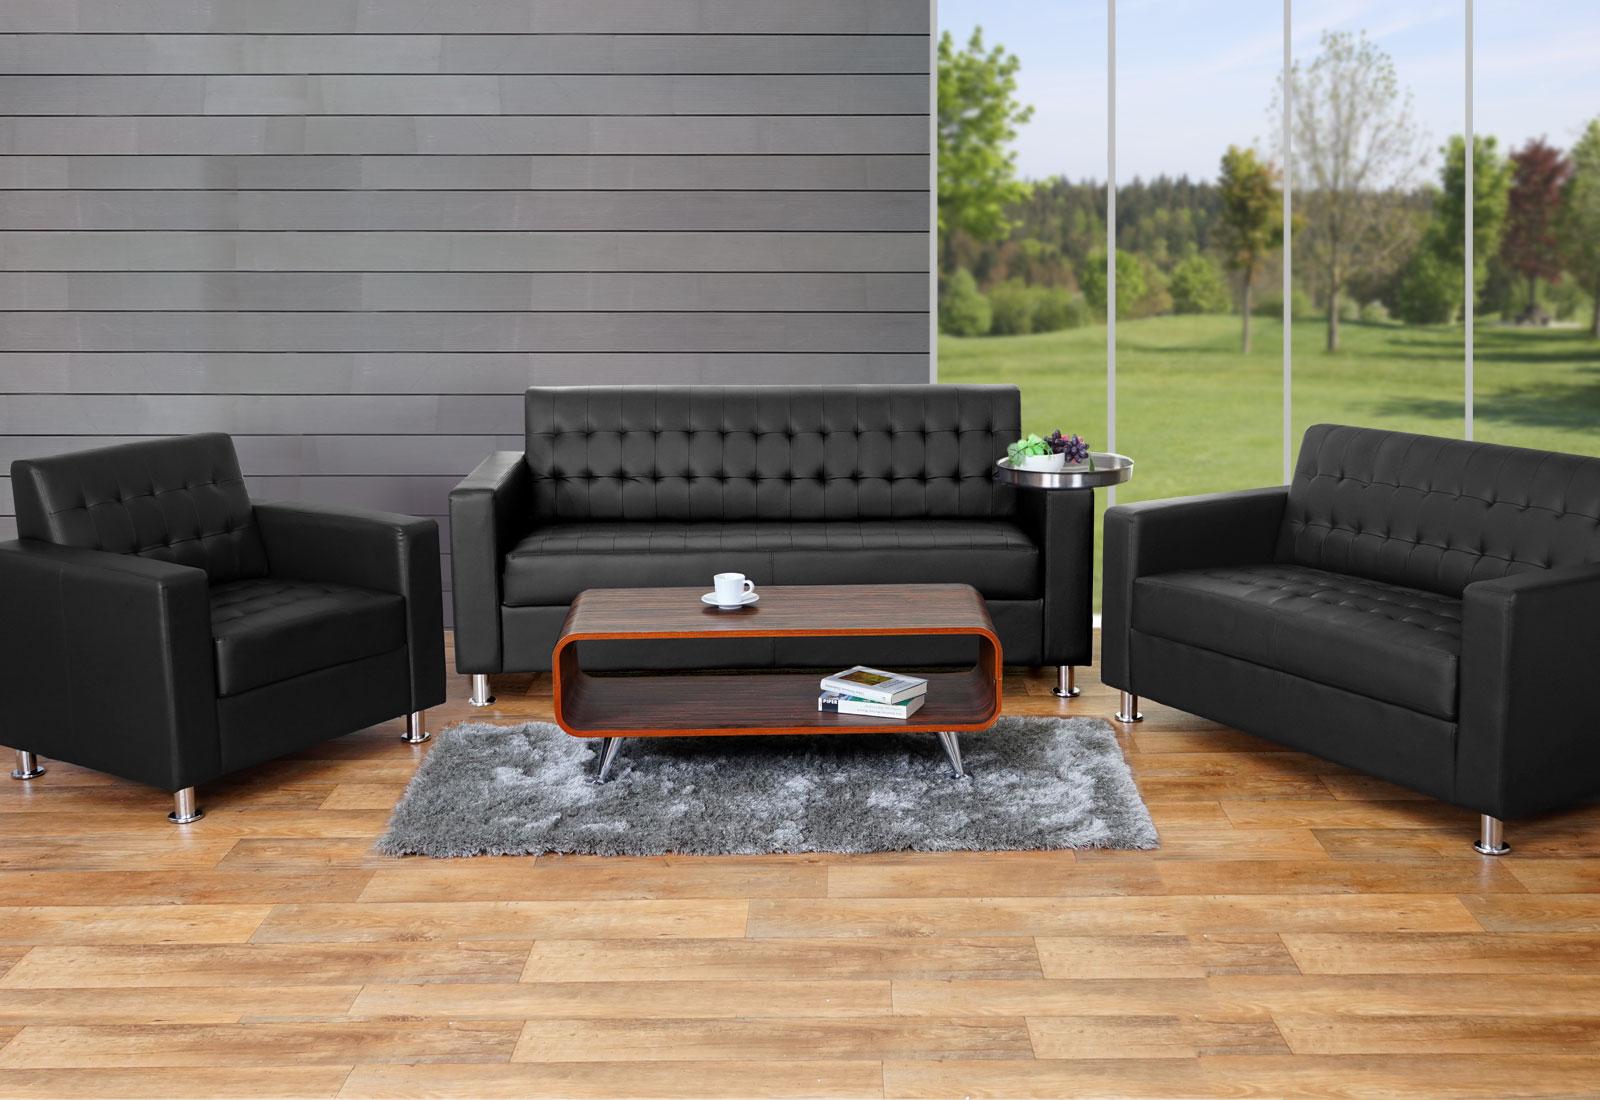 3 2 1 sofagarnitur kunda couch loungesofa kunstleder metall f e schwarz. Black Bedroom Furniture Sets. Home Design Ideas